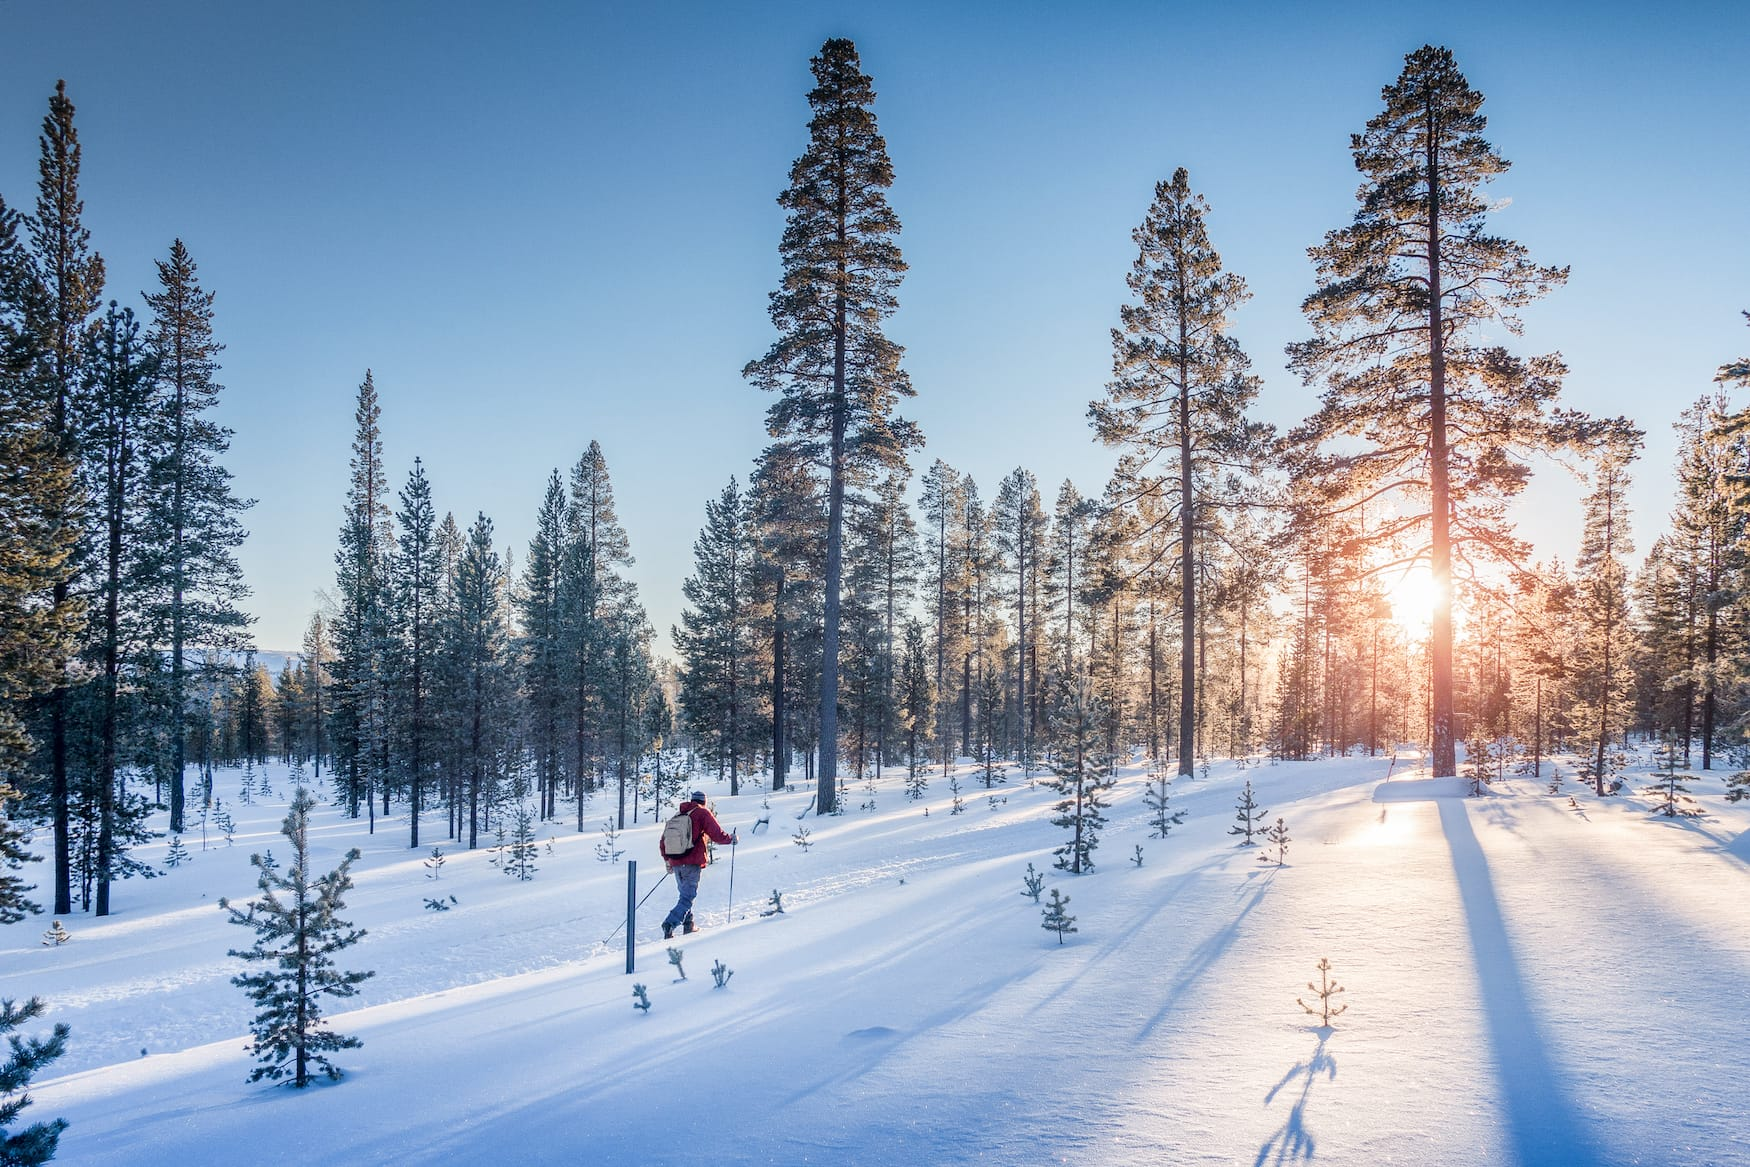 Langlauf in Winterlandschaft